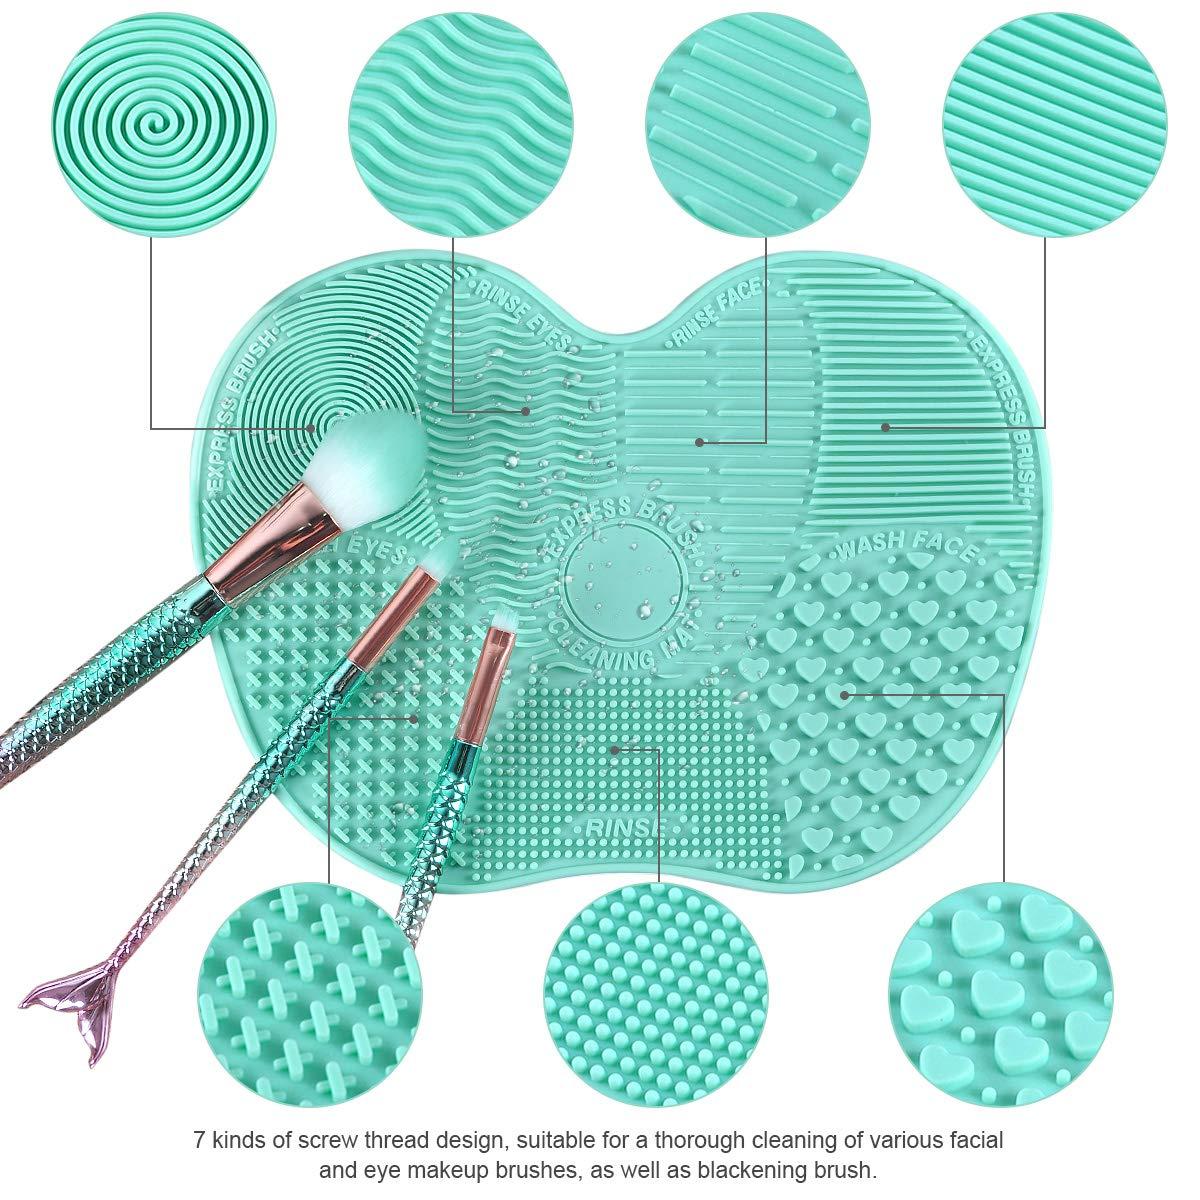 LoveinDIY 2pcs Serrate Edge Pattern Tracer Tracing Wheel Dressmakers DIY Sewing Tools